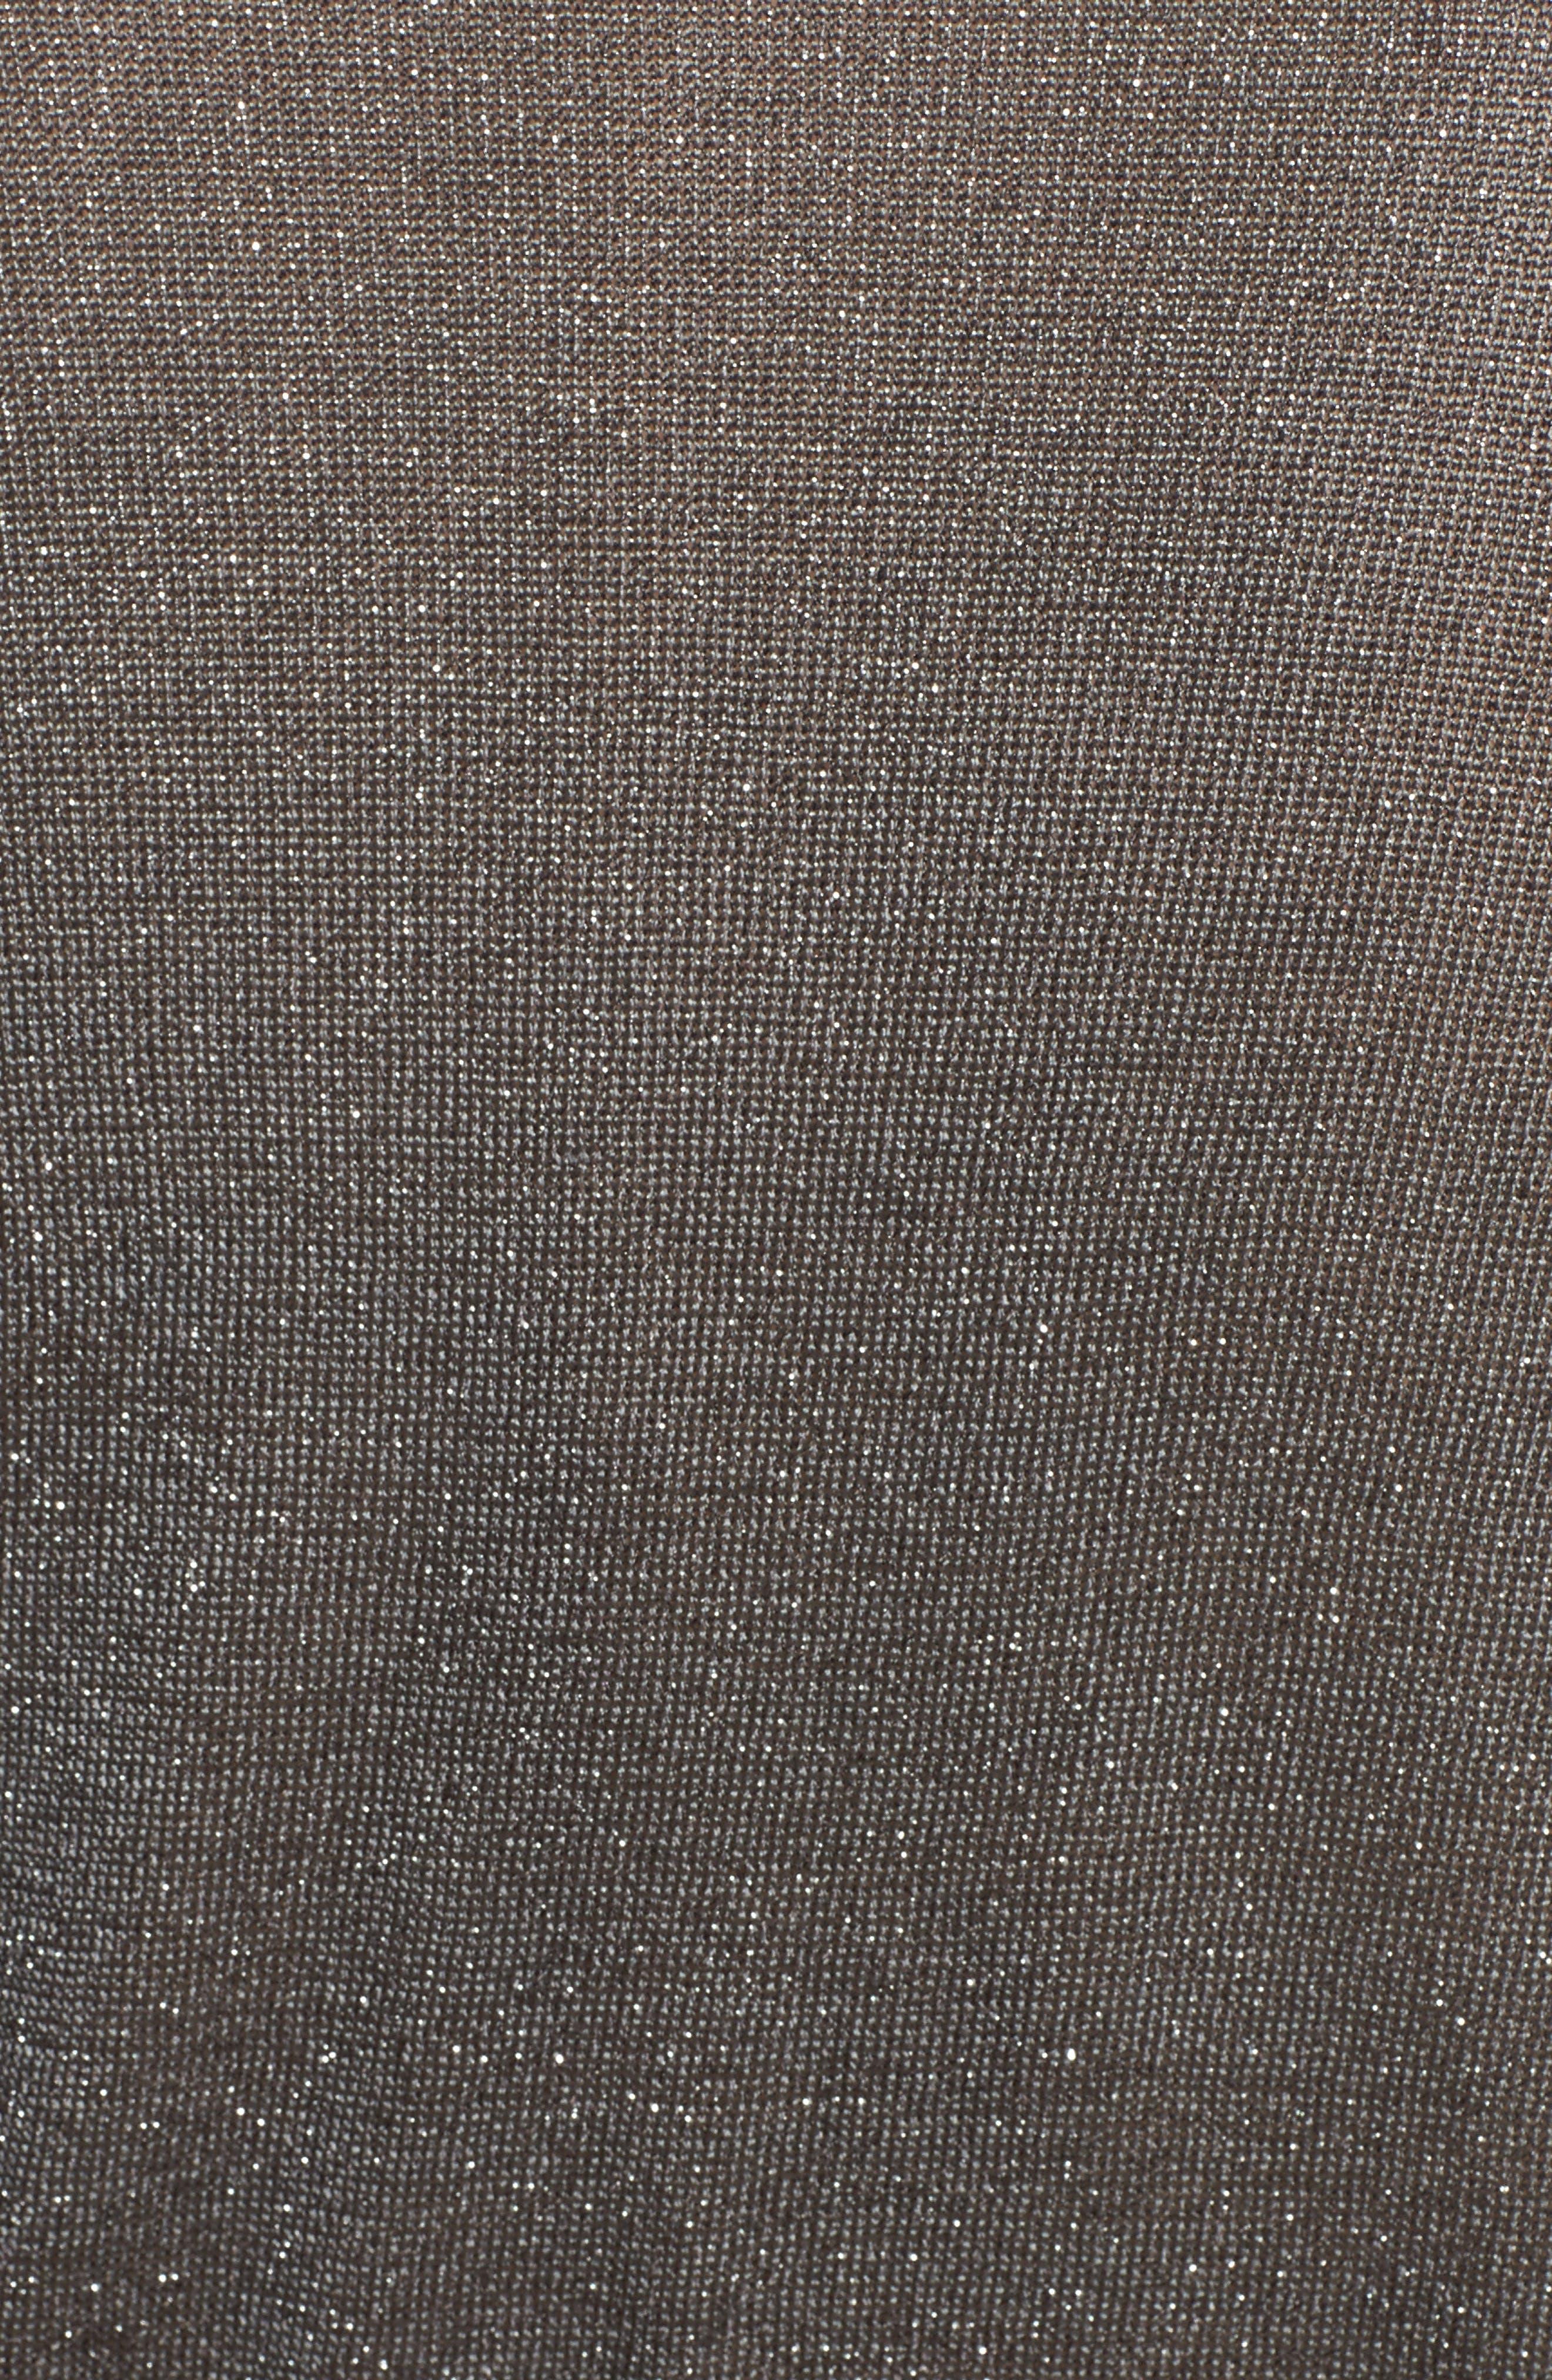 Tiered Ruffle Sleeve Metallic Top,                             Alternate thumbnail 5, color,                             020